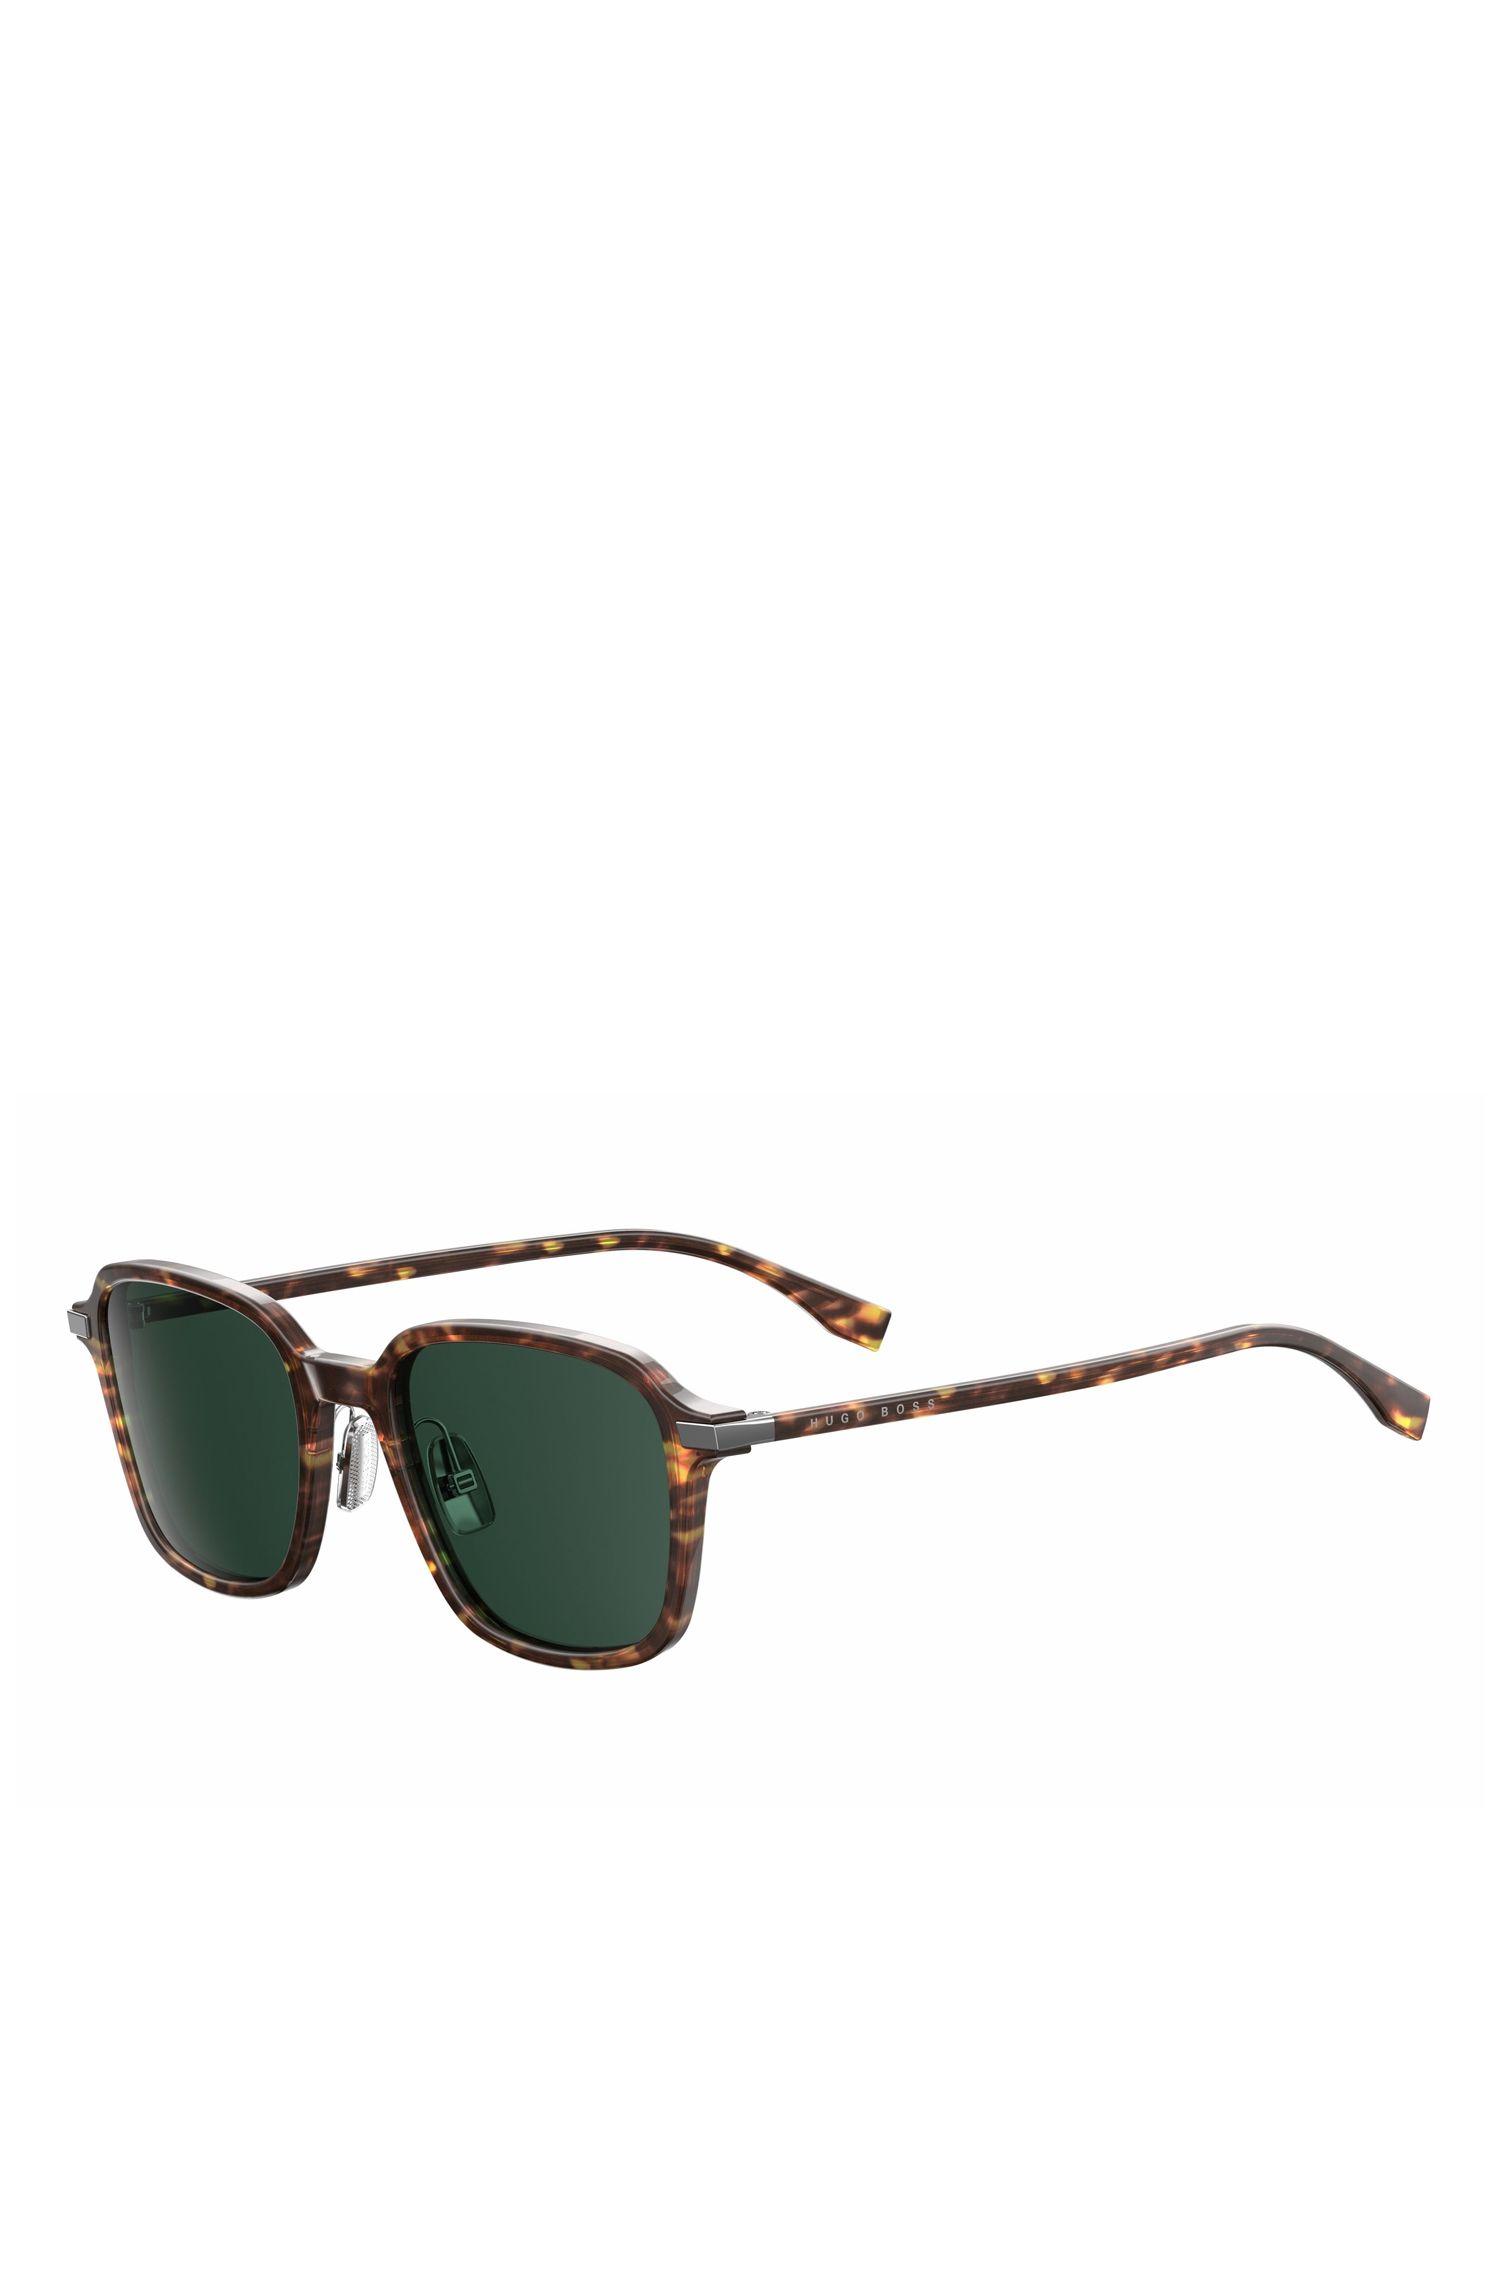 '0909S' | Green Lens Havana Square Sunglasses